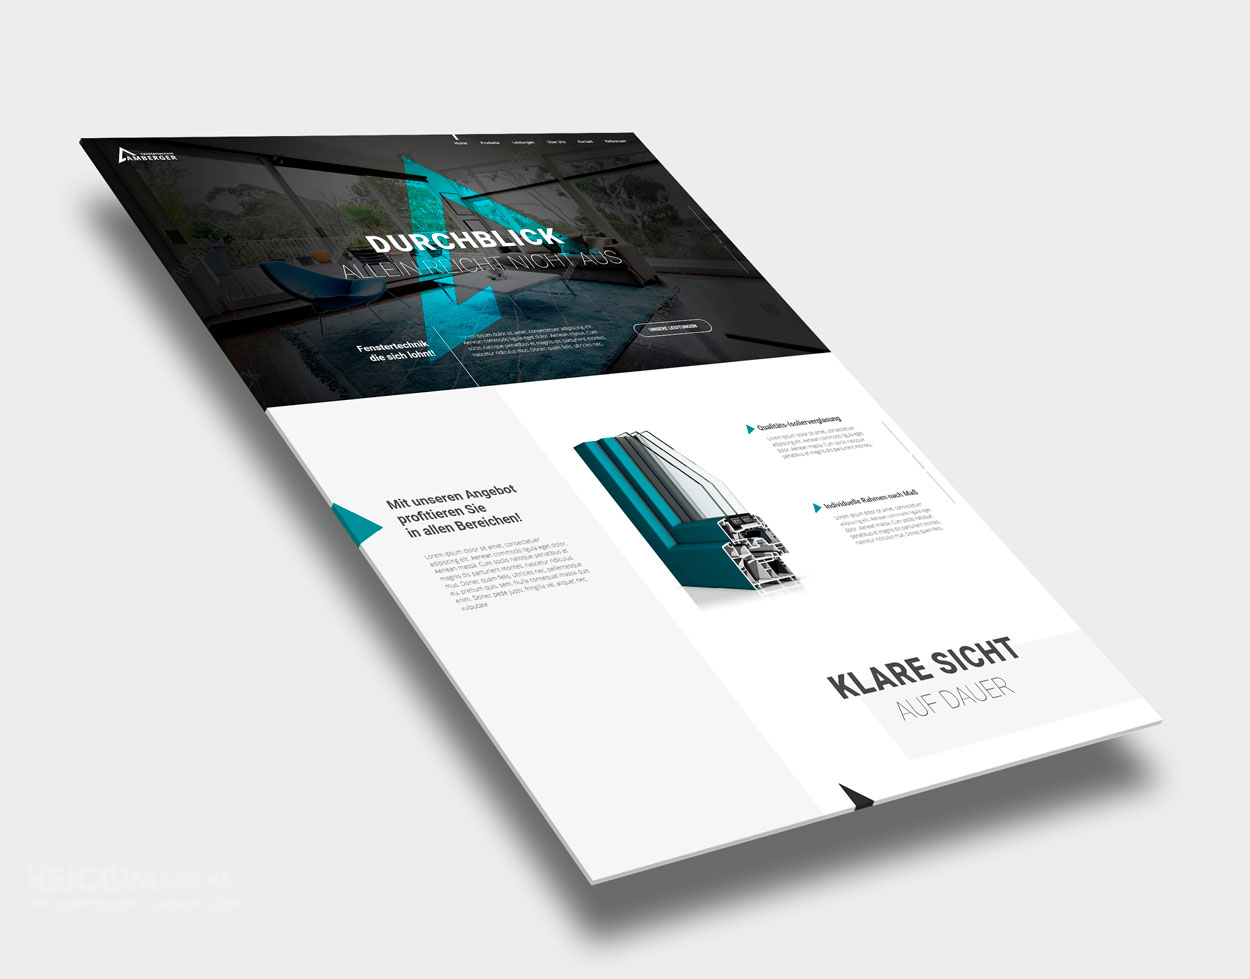 screendesign-webdesign-agentur-cham-heicom-systems